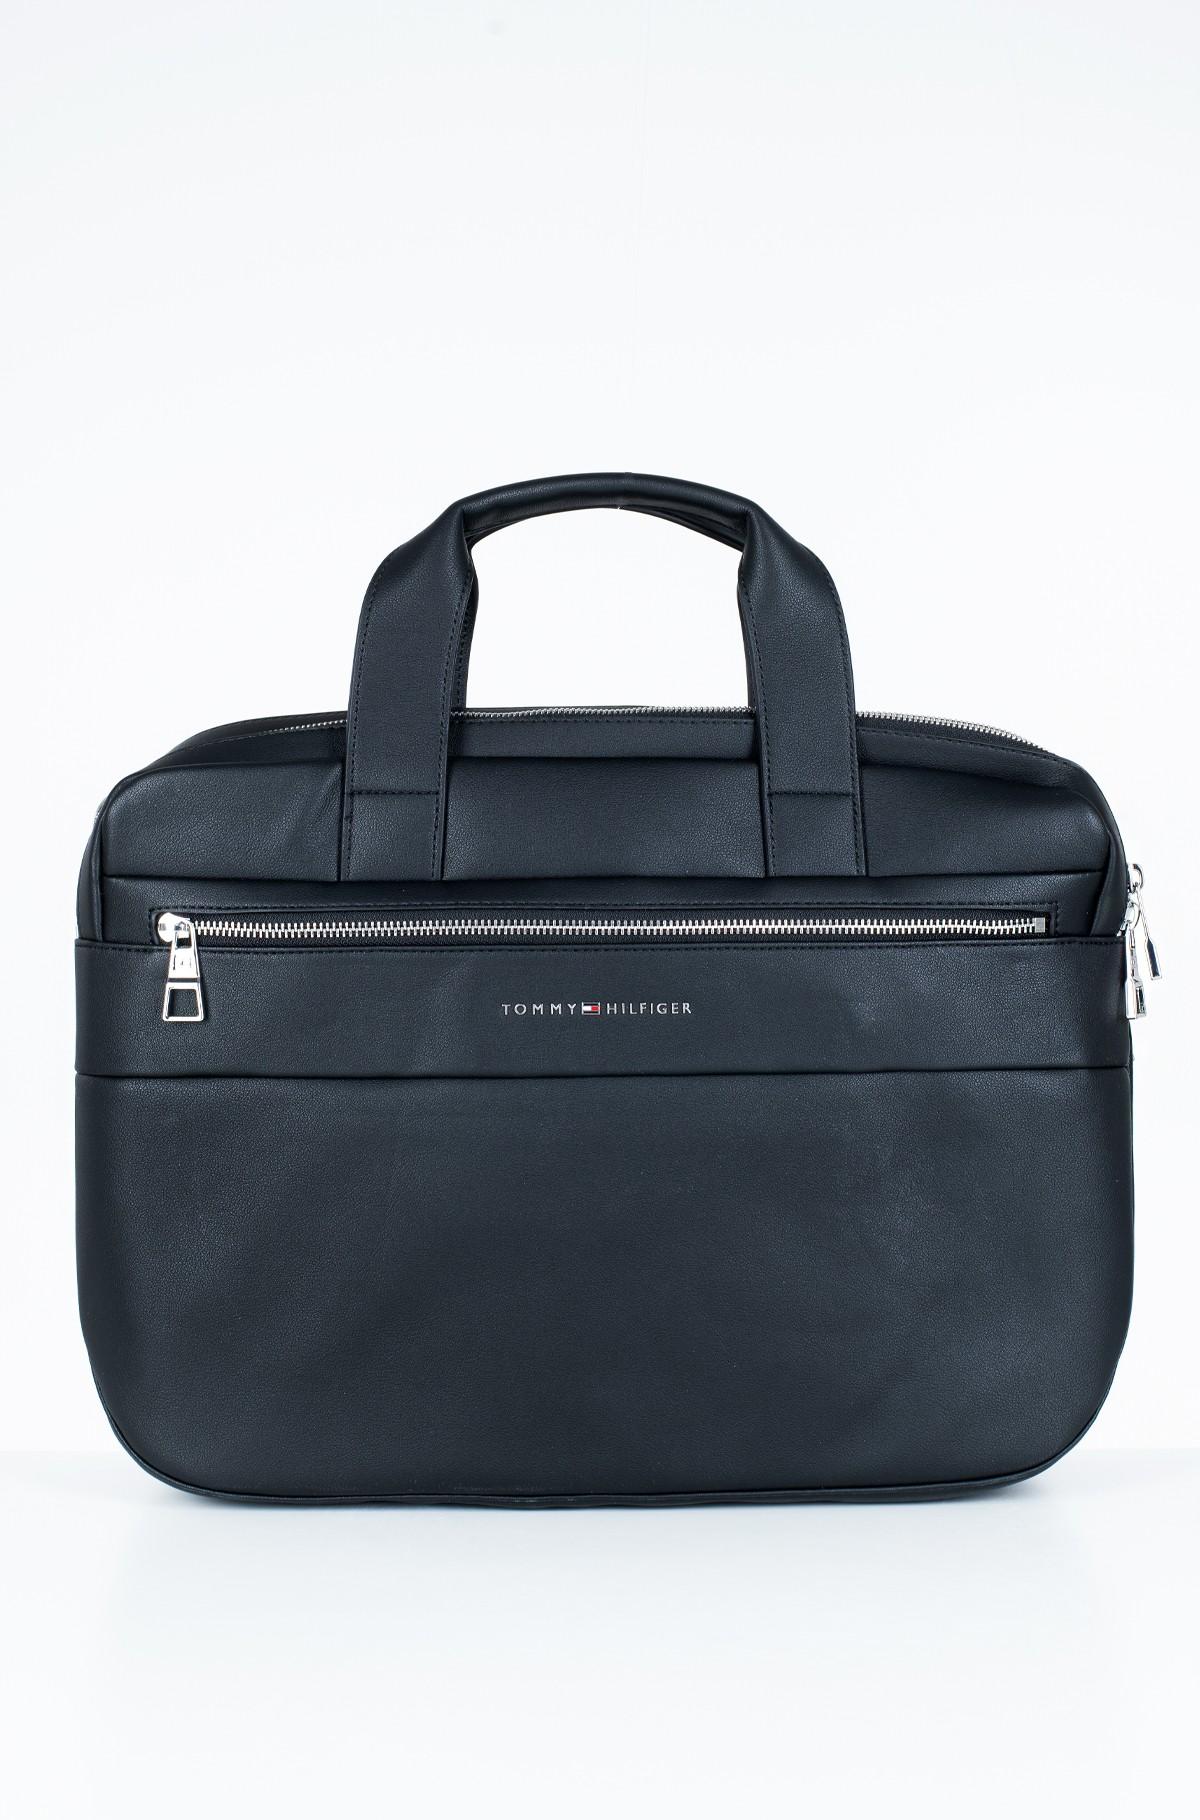 Kompiuterio krepšys  NOVELTY MIX WORKBAG-full-1